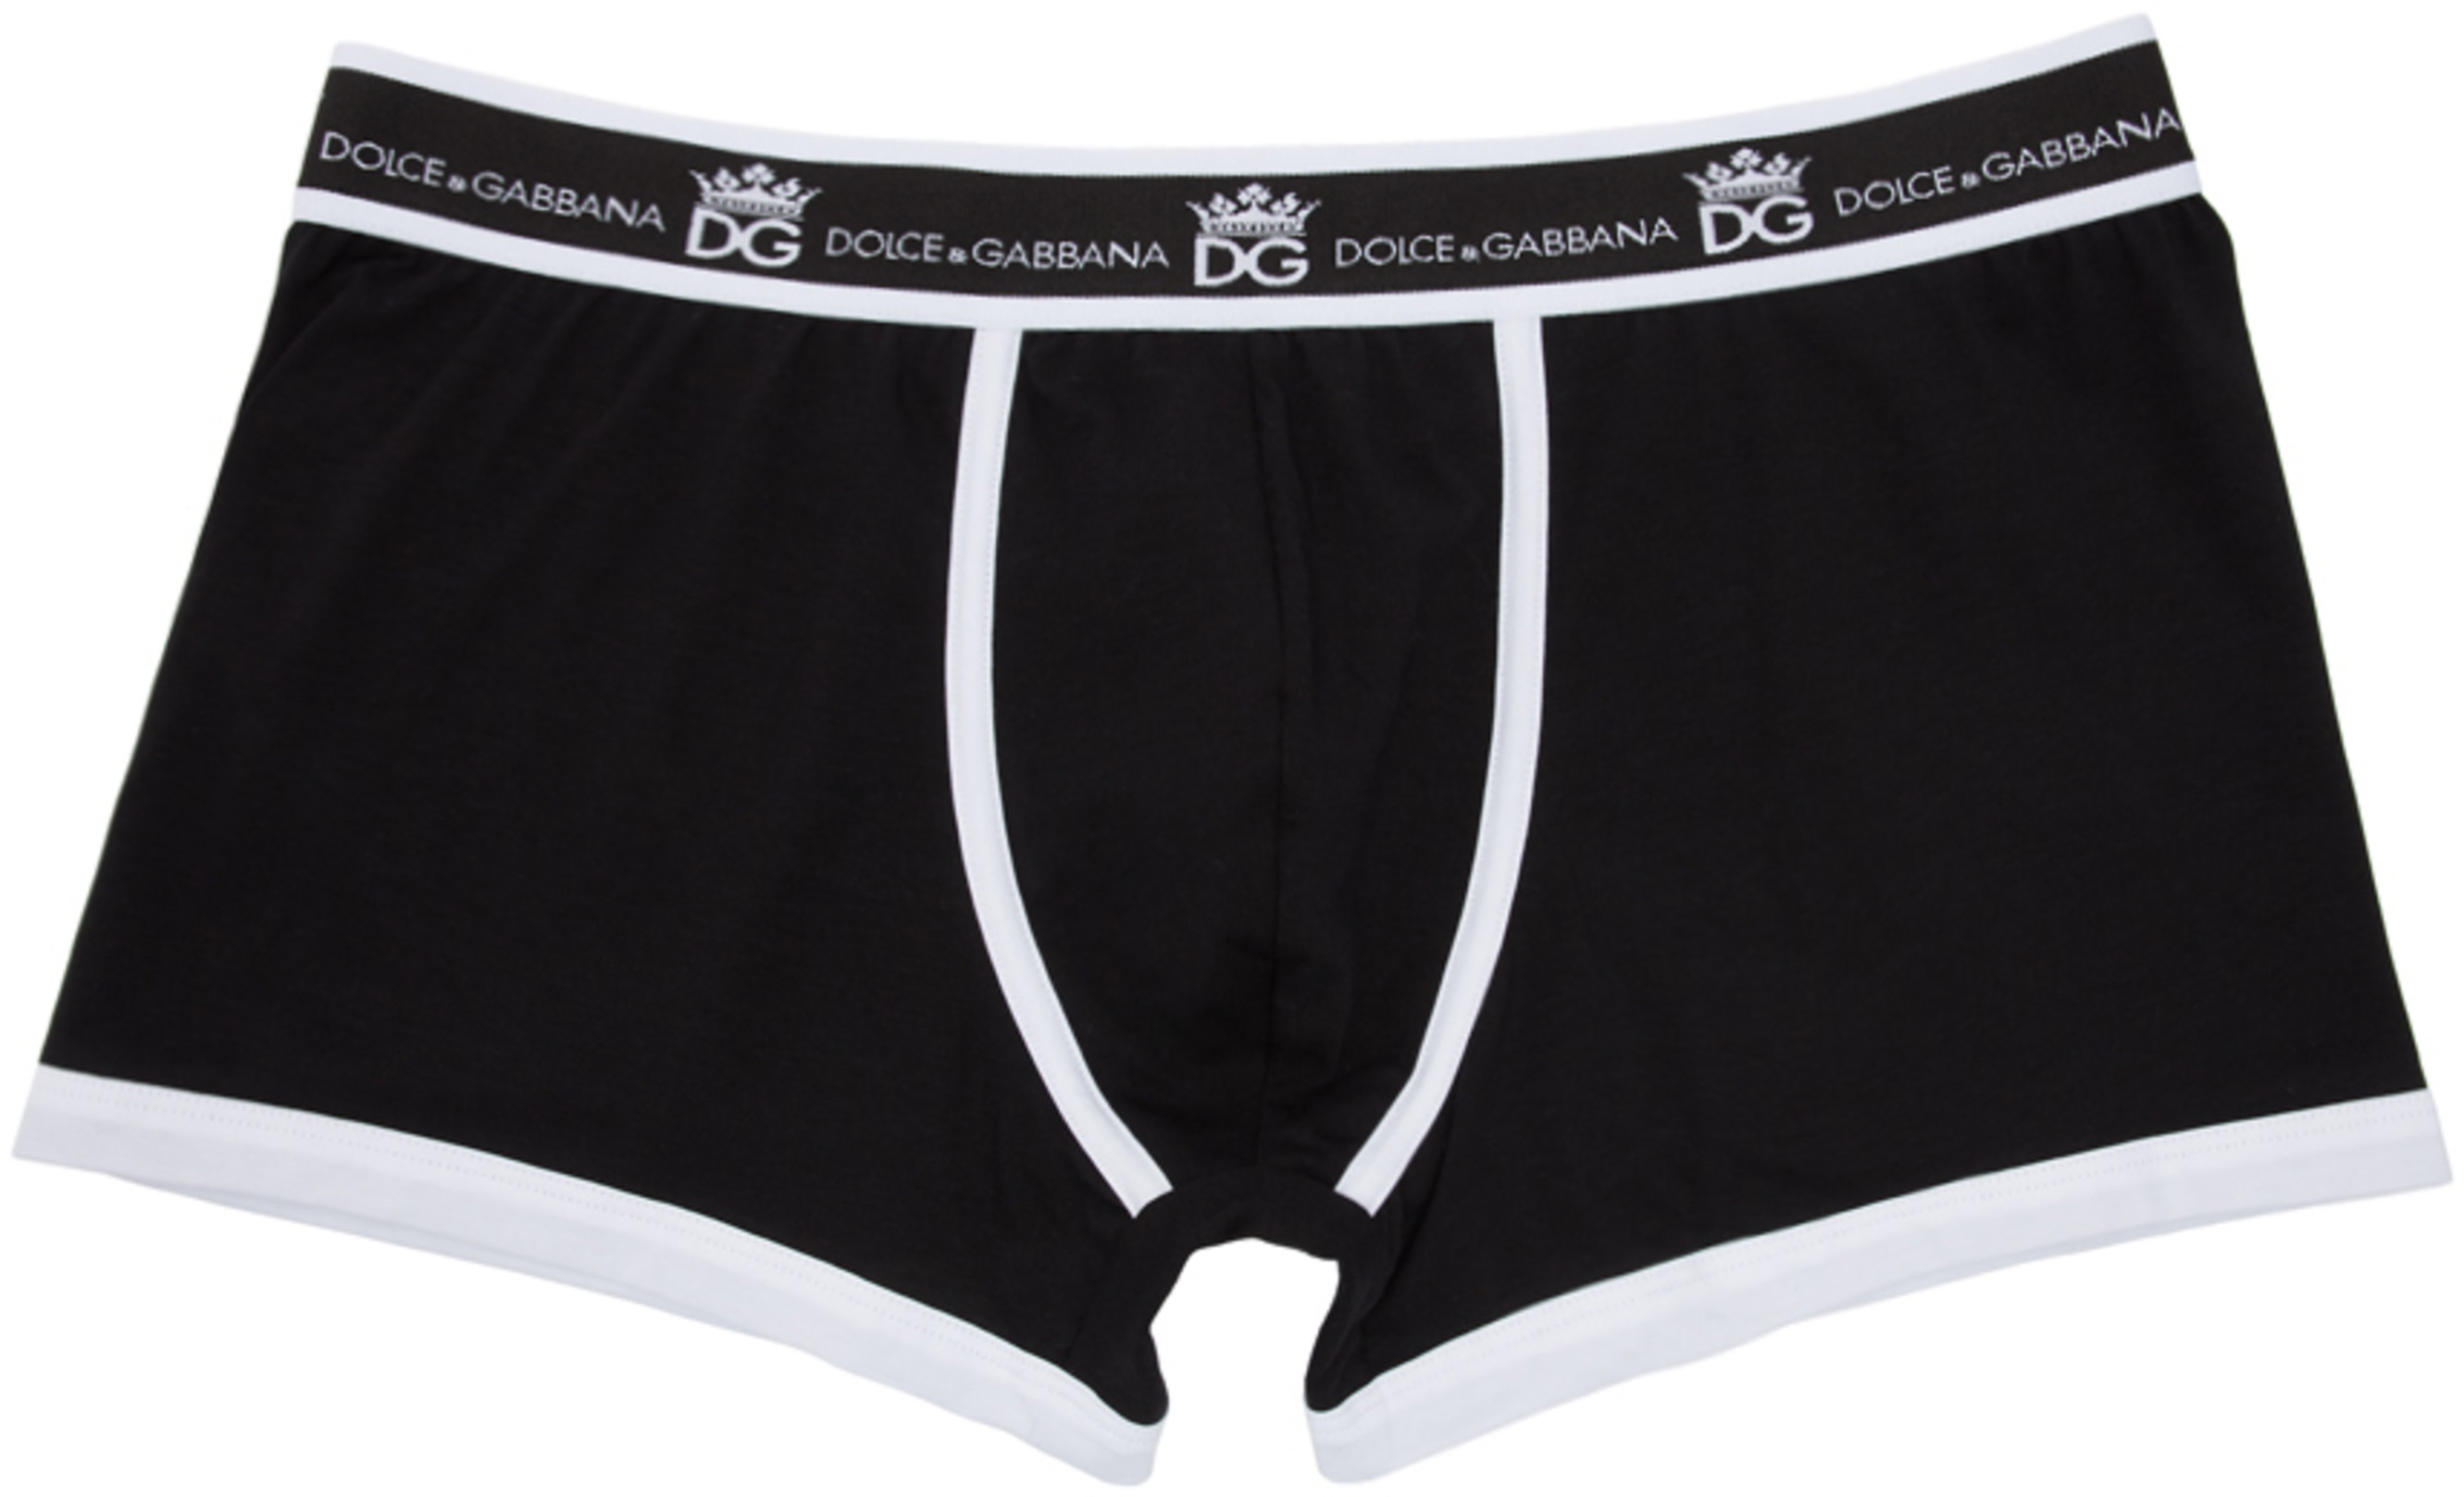 60ff5228dd752 Dolce & Gabbana for Men SS19 Collection | SSENSE